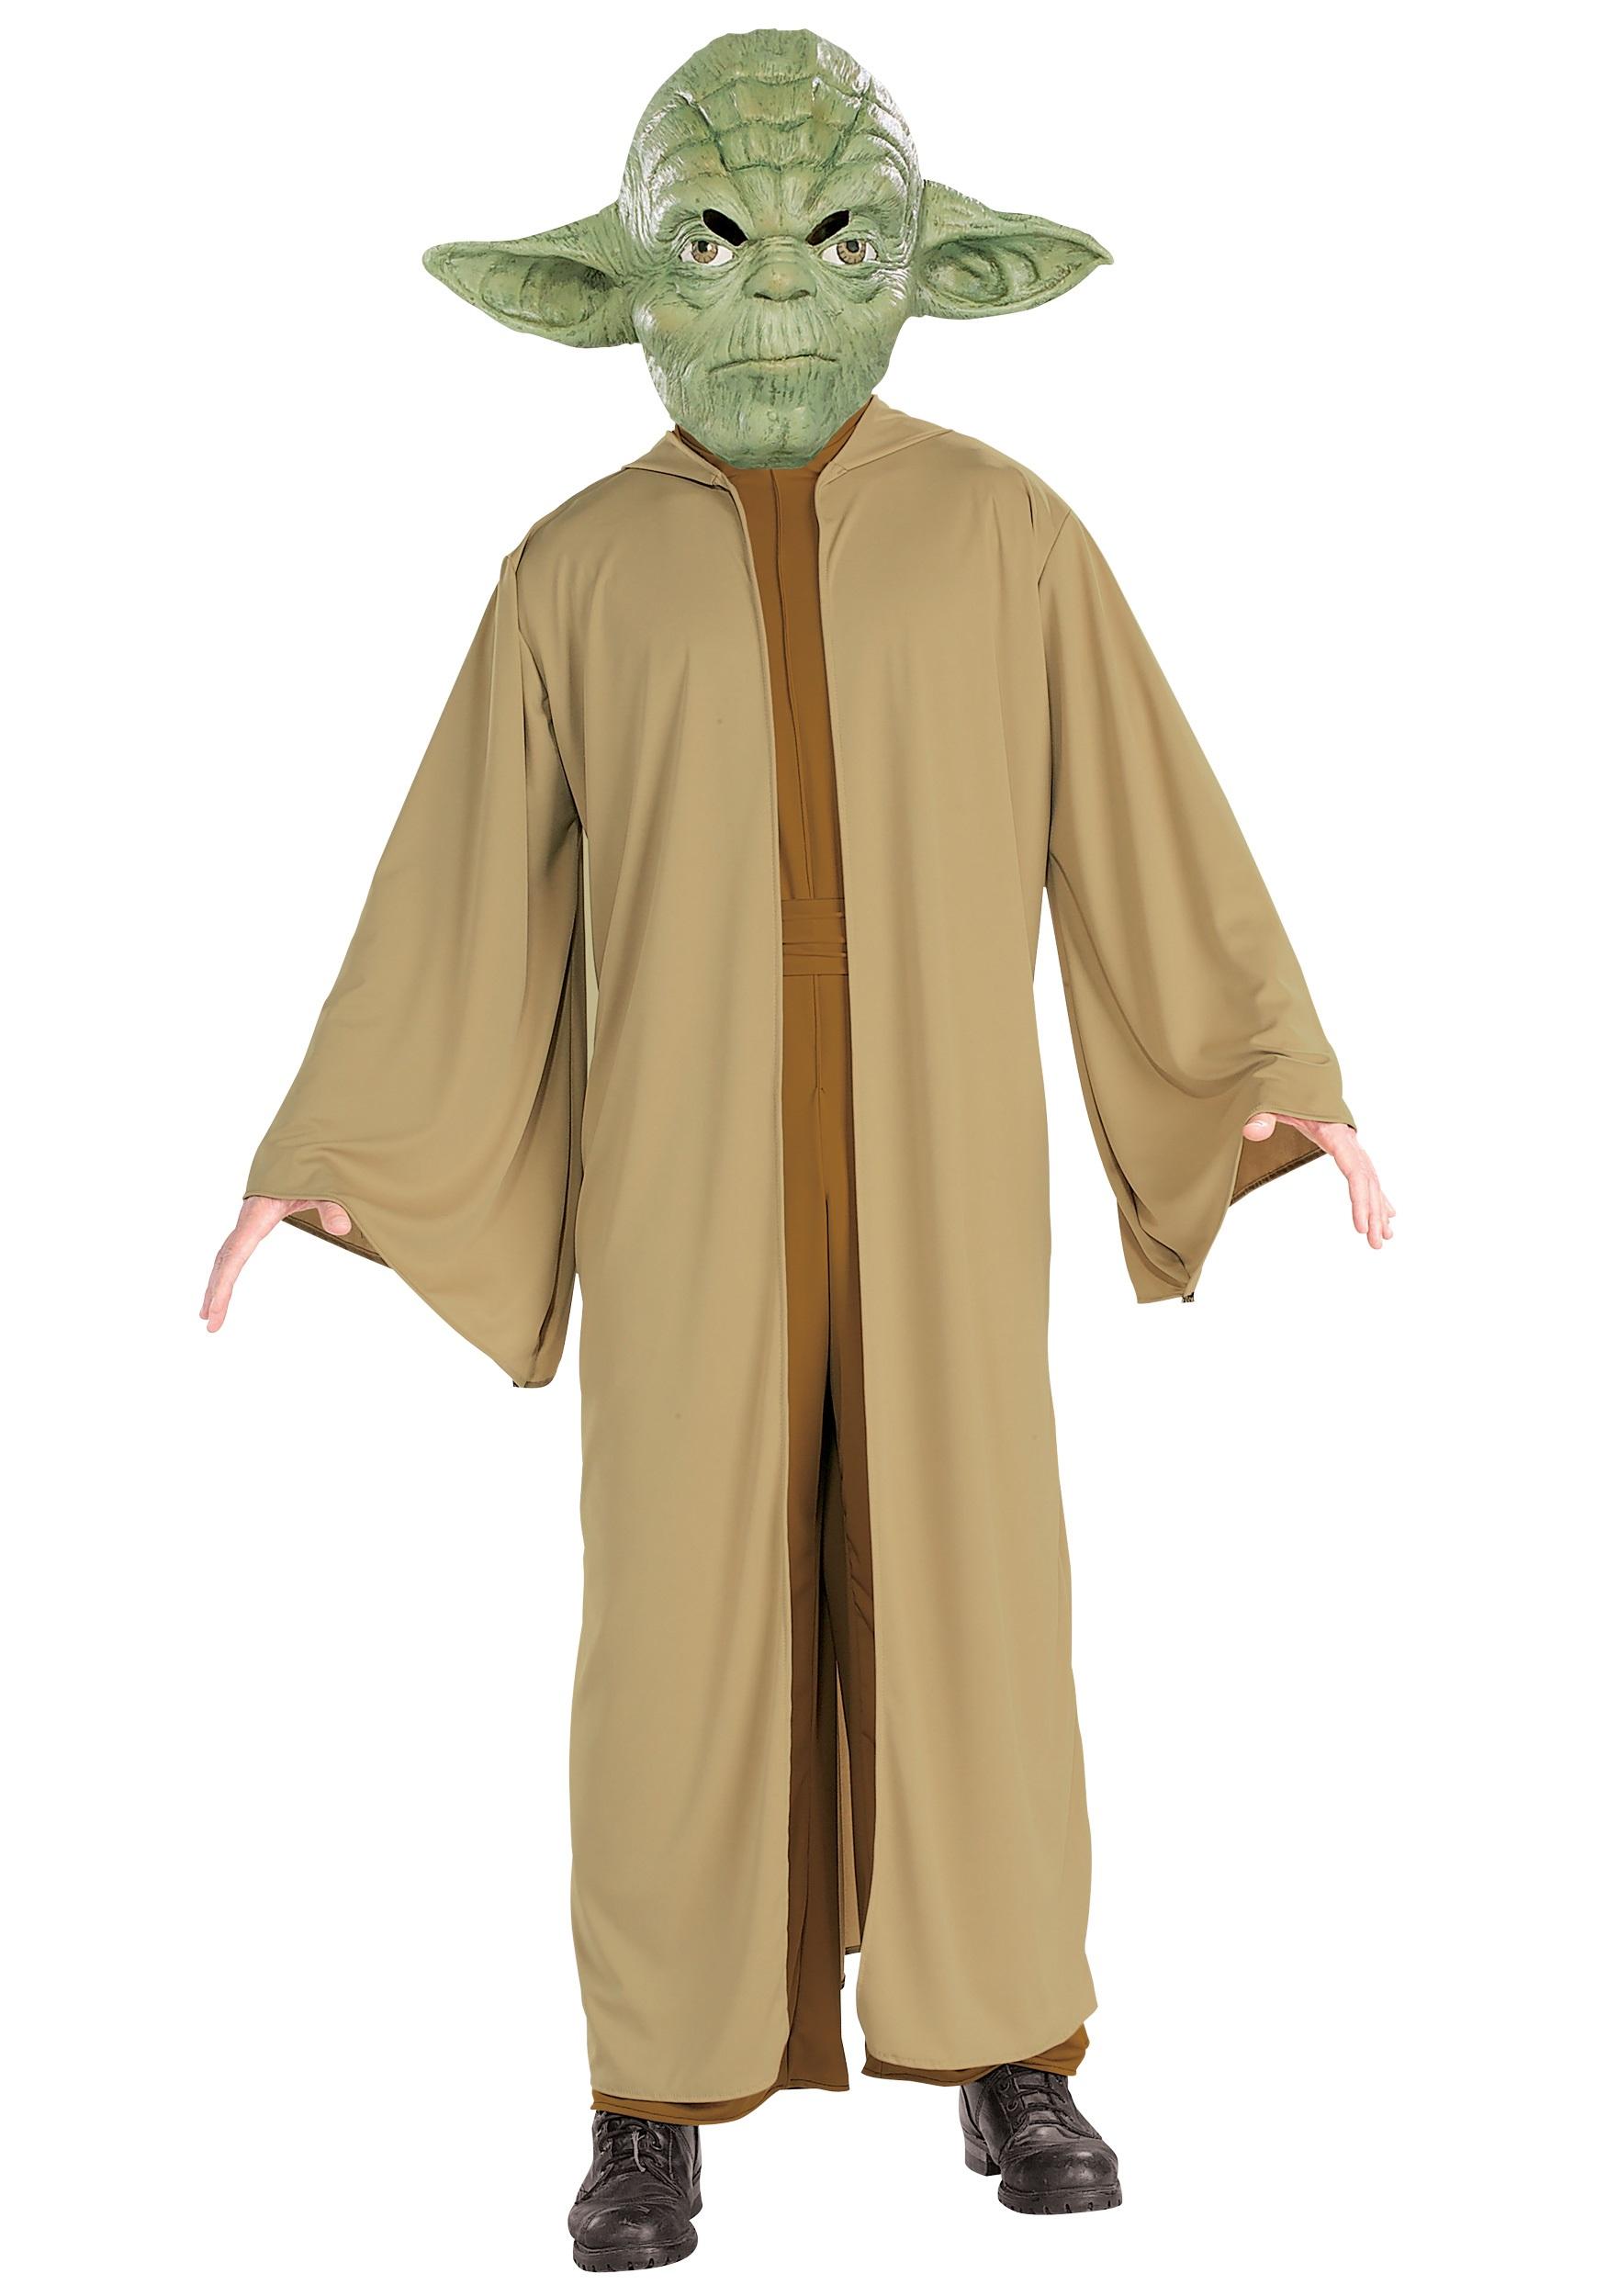 Costume adult yoda